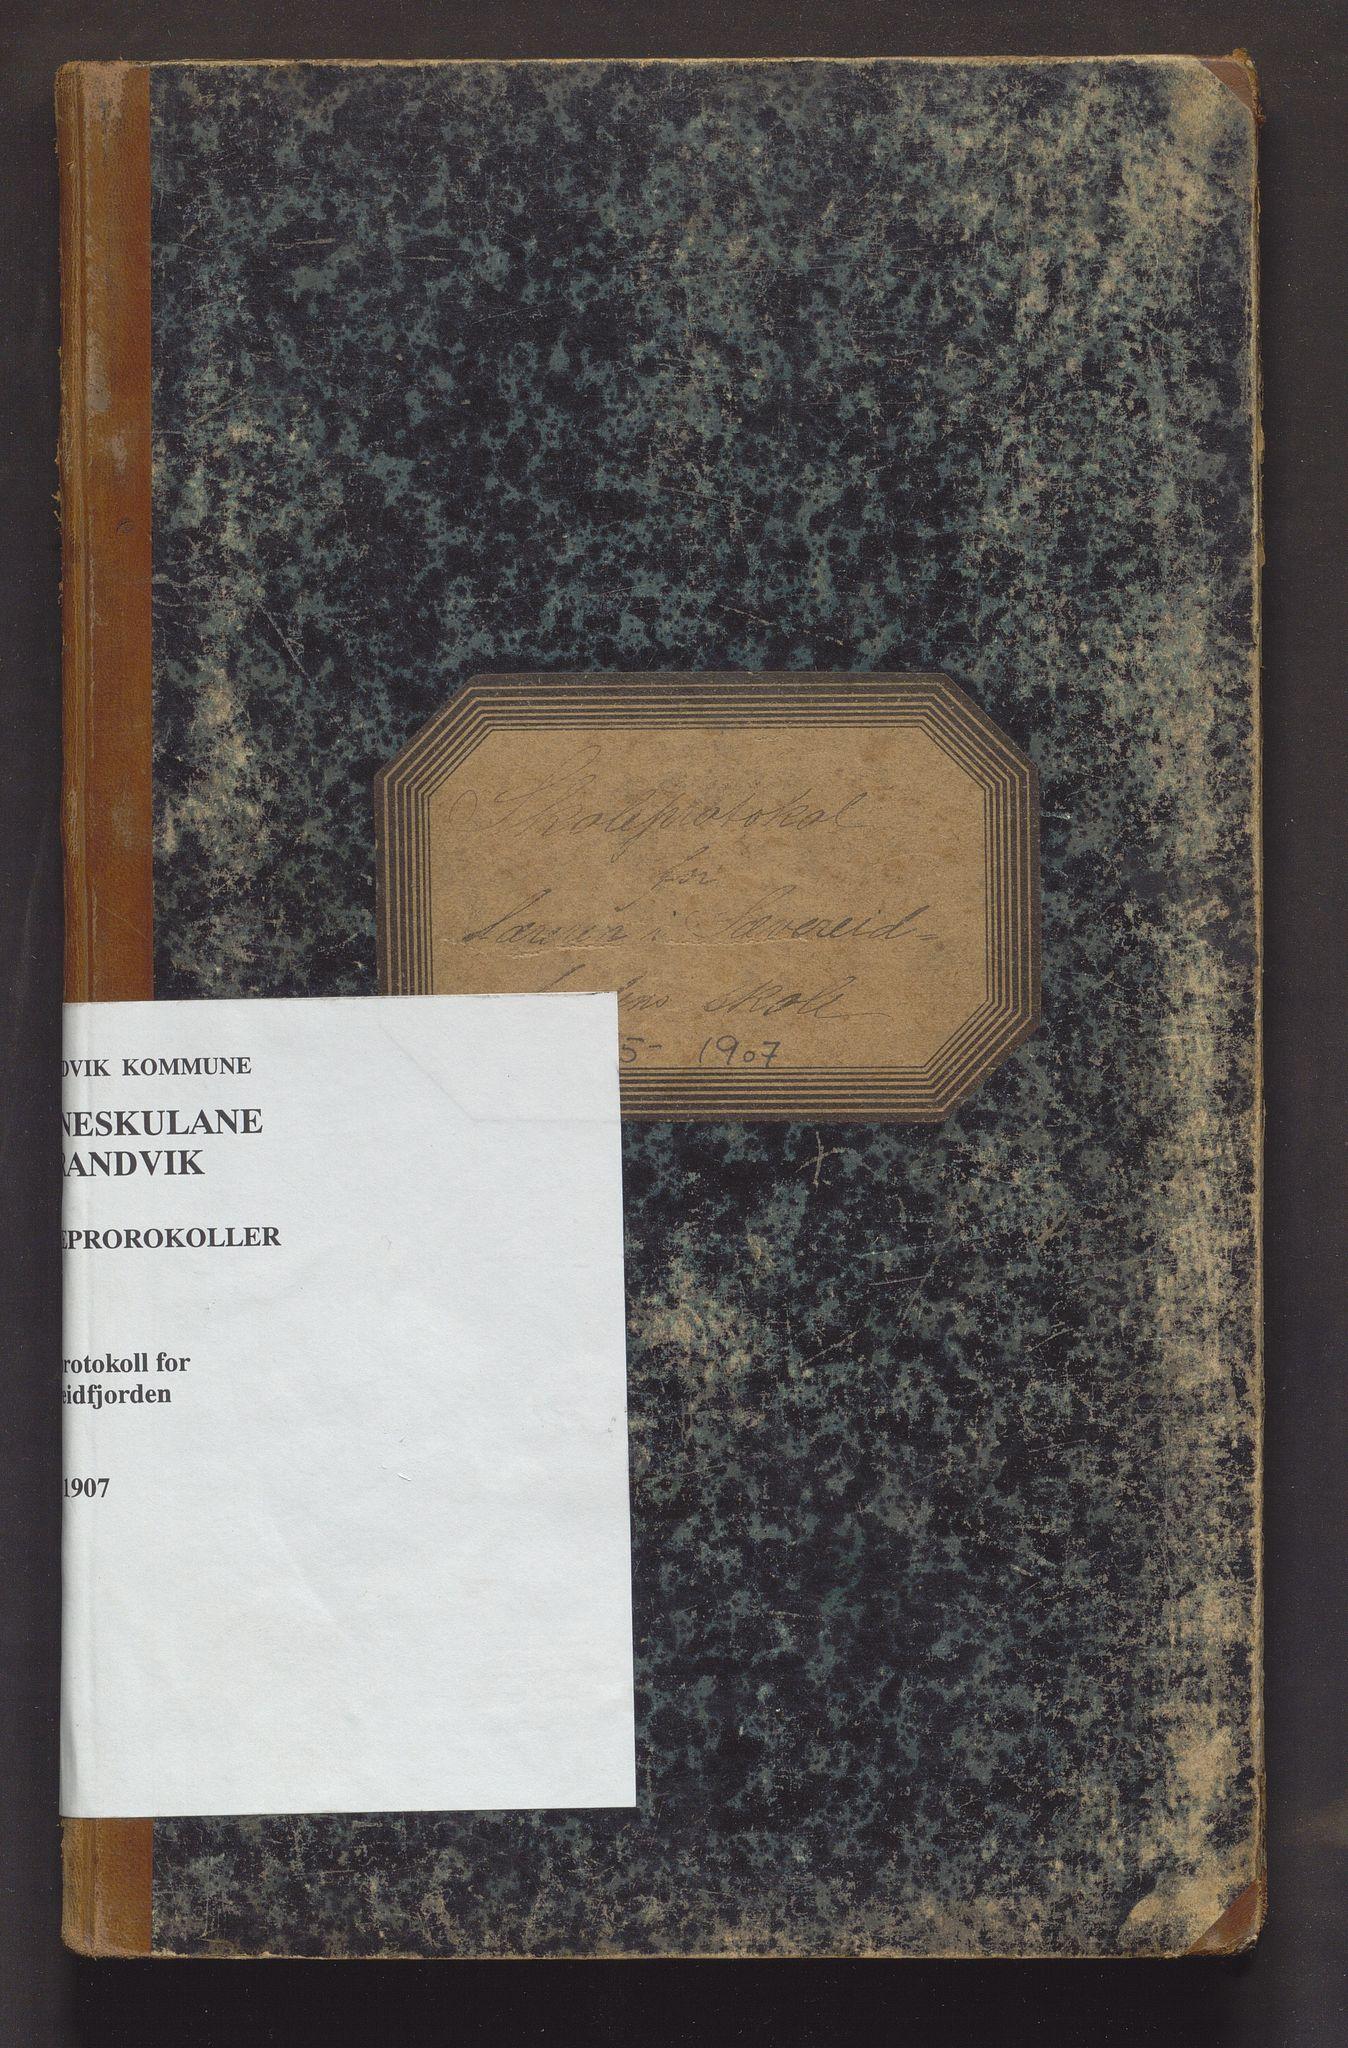 IKAH, Strandvik kommune. Barneskulane, F/Fa/L0009: Skuleprotokoll for Sævareidfjorden og Håvik krinsar i Fuse Præstegjeld, 1895-1907